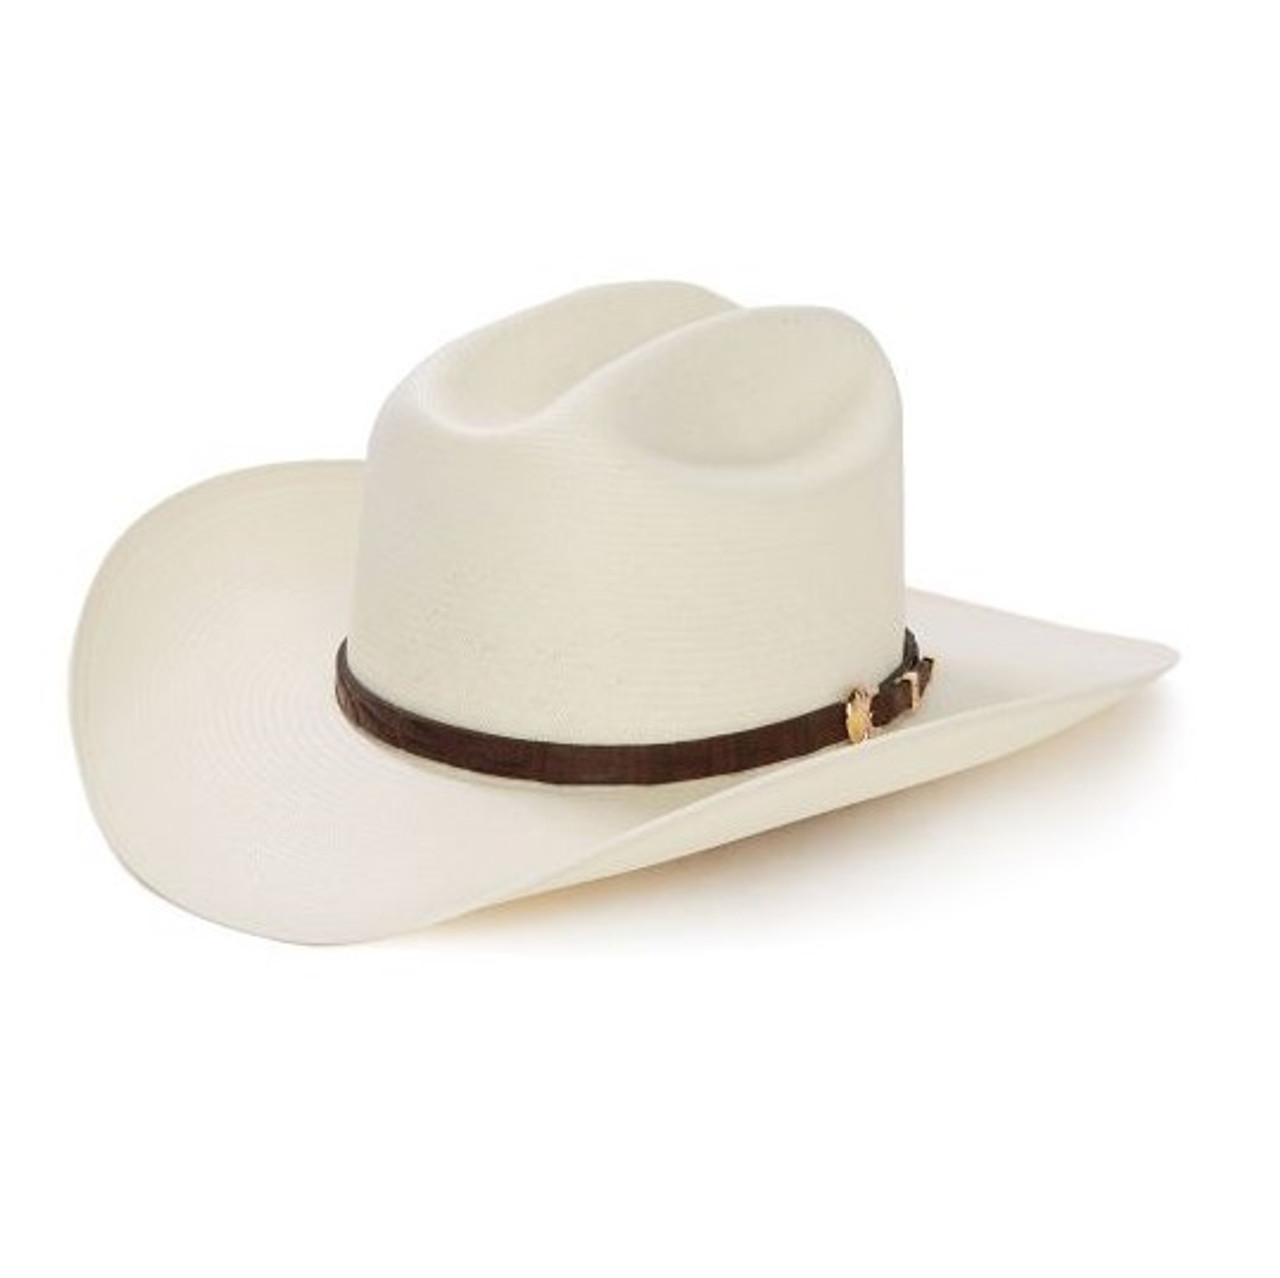 Stetson Mens Hats - Evilla De Oro - 1000X Straw Cowboy Hat - Billy s ... 0751a32b439